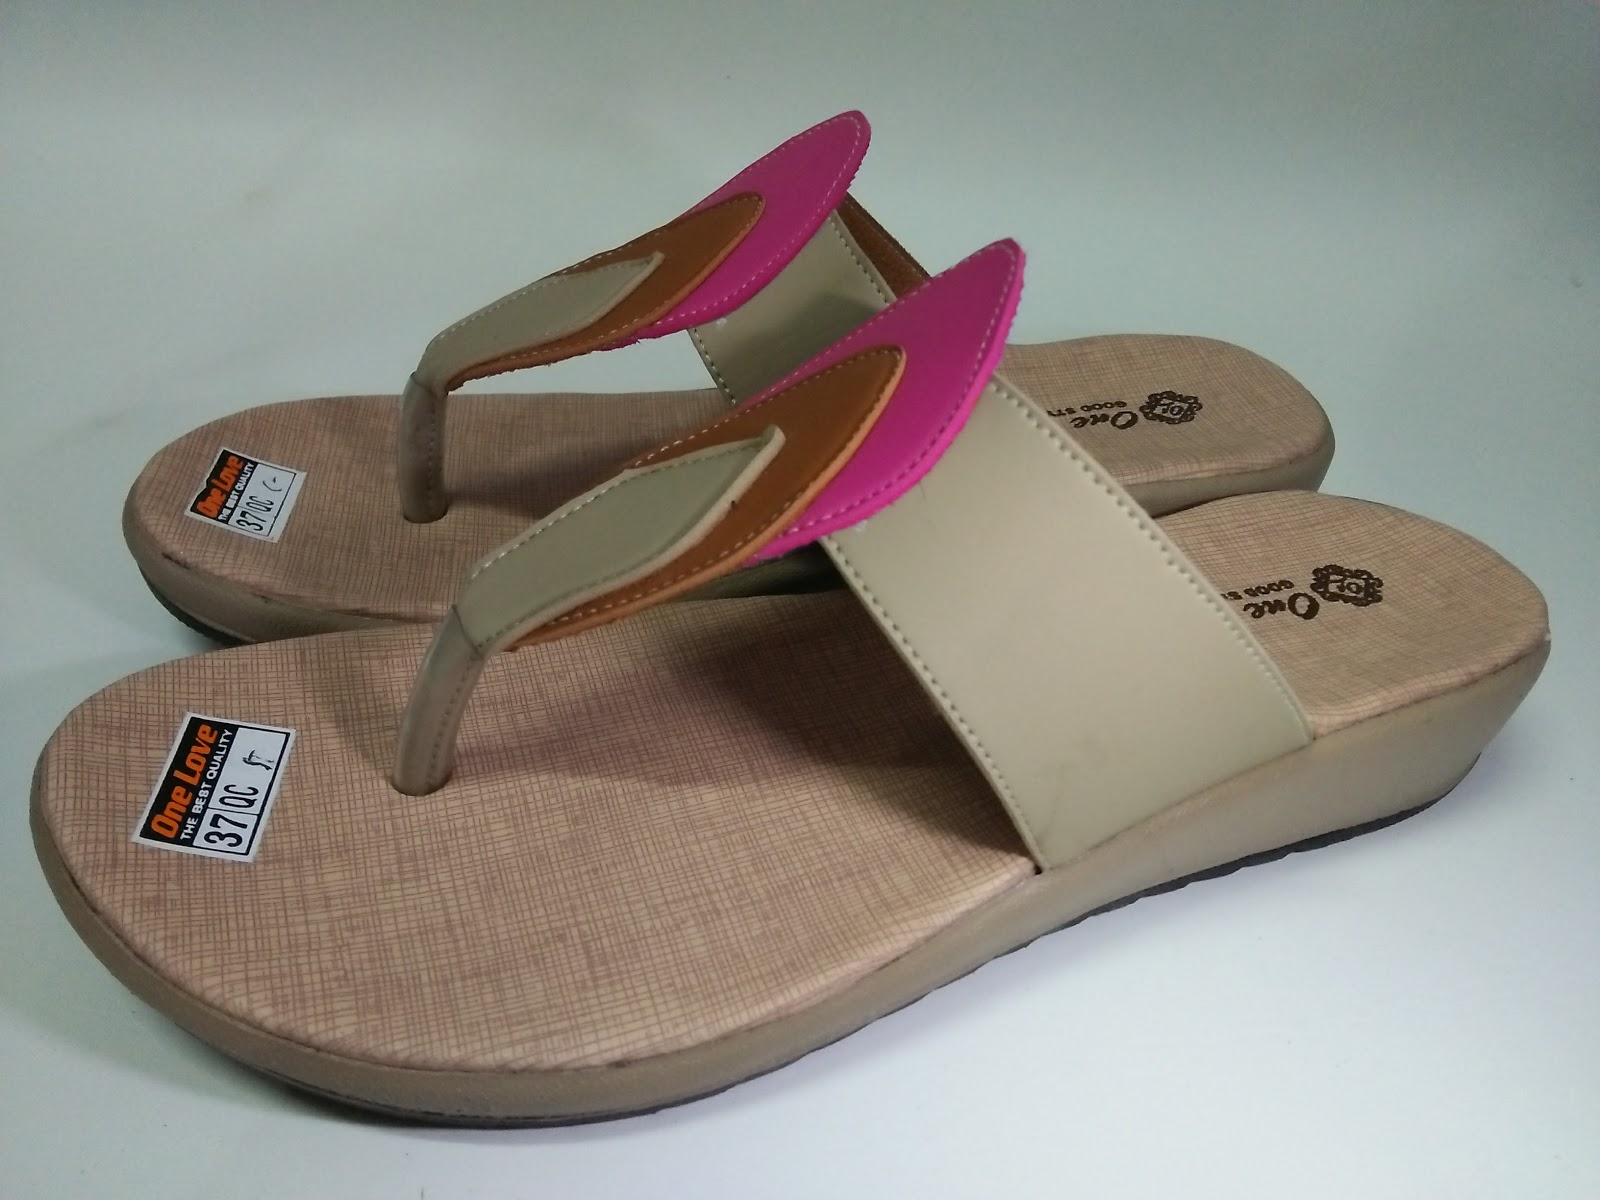 Grosir sandal cewek HS japit tunas sandal kulit sintetis ...